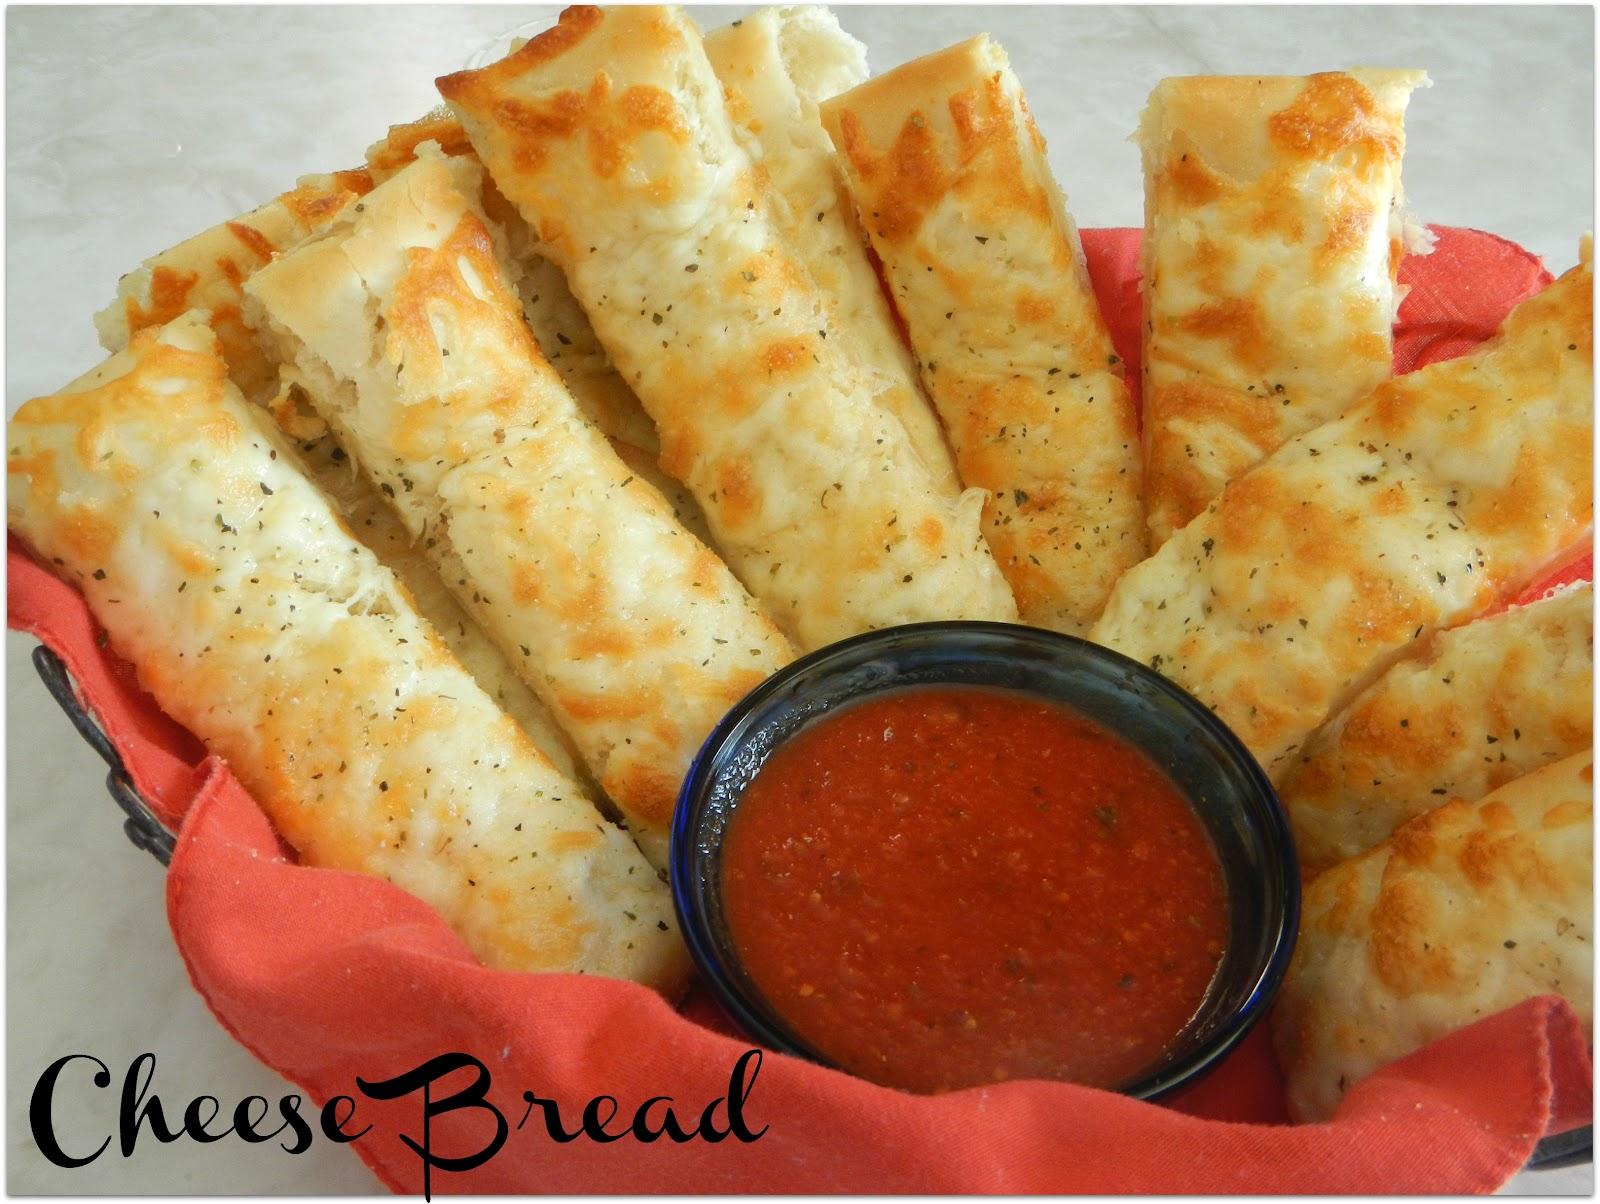 Aubrey's Recipes: Cheese Bread